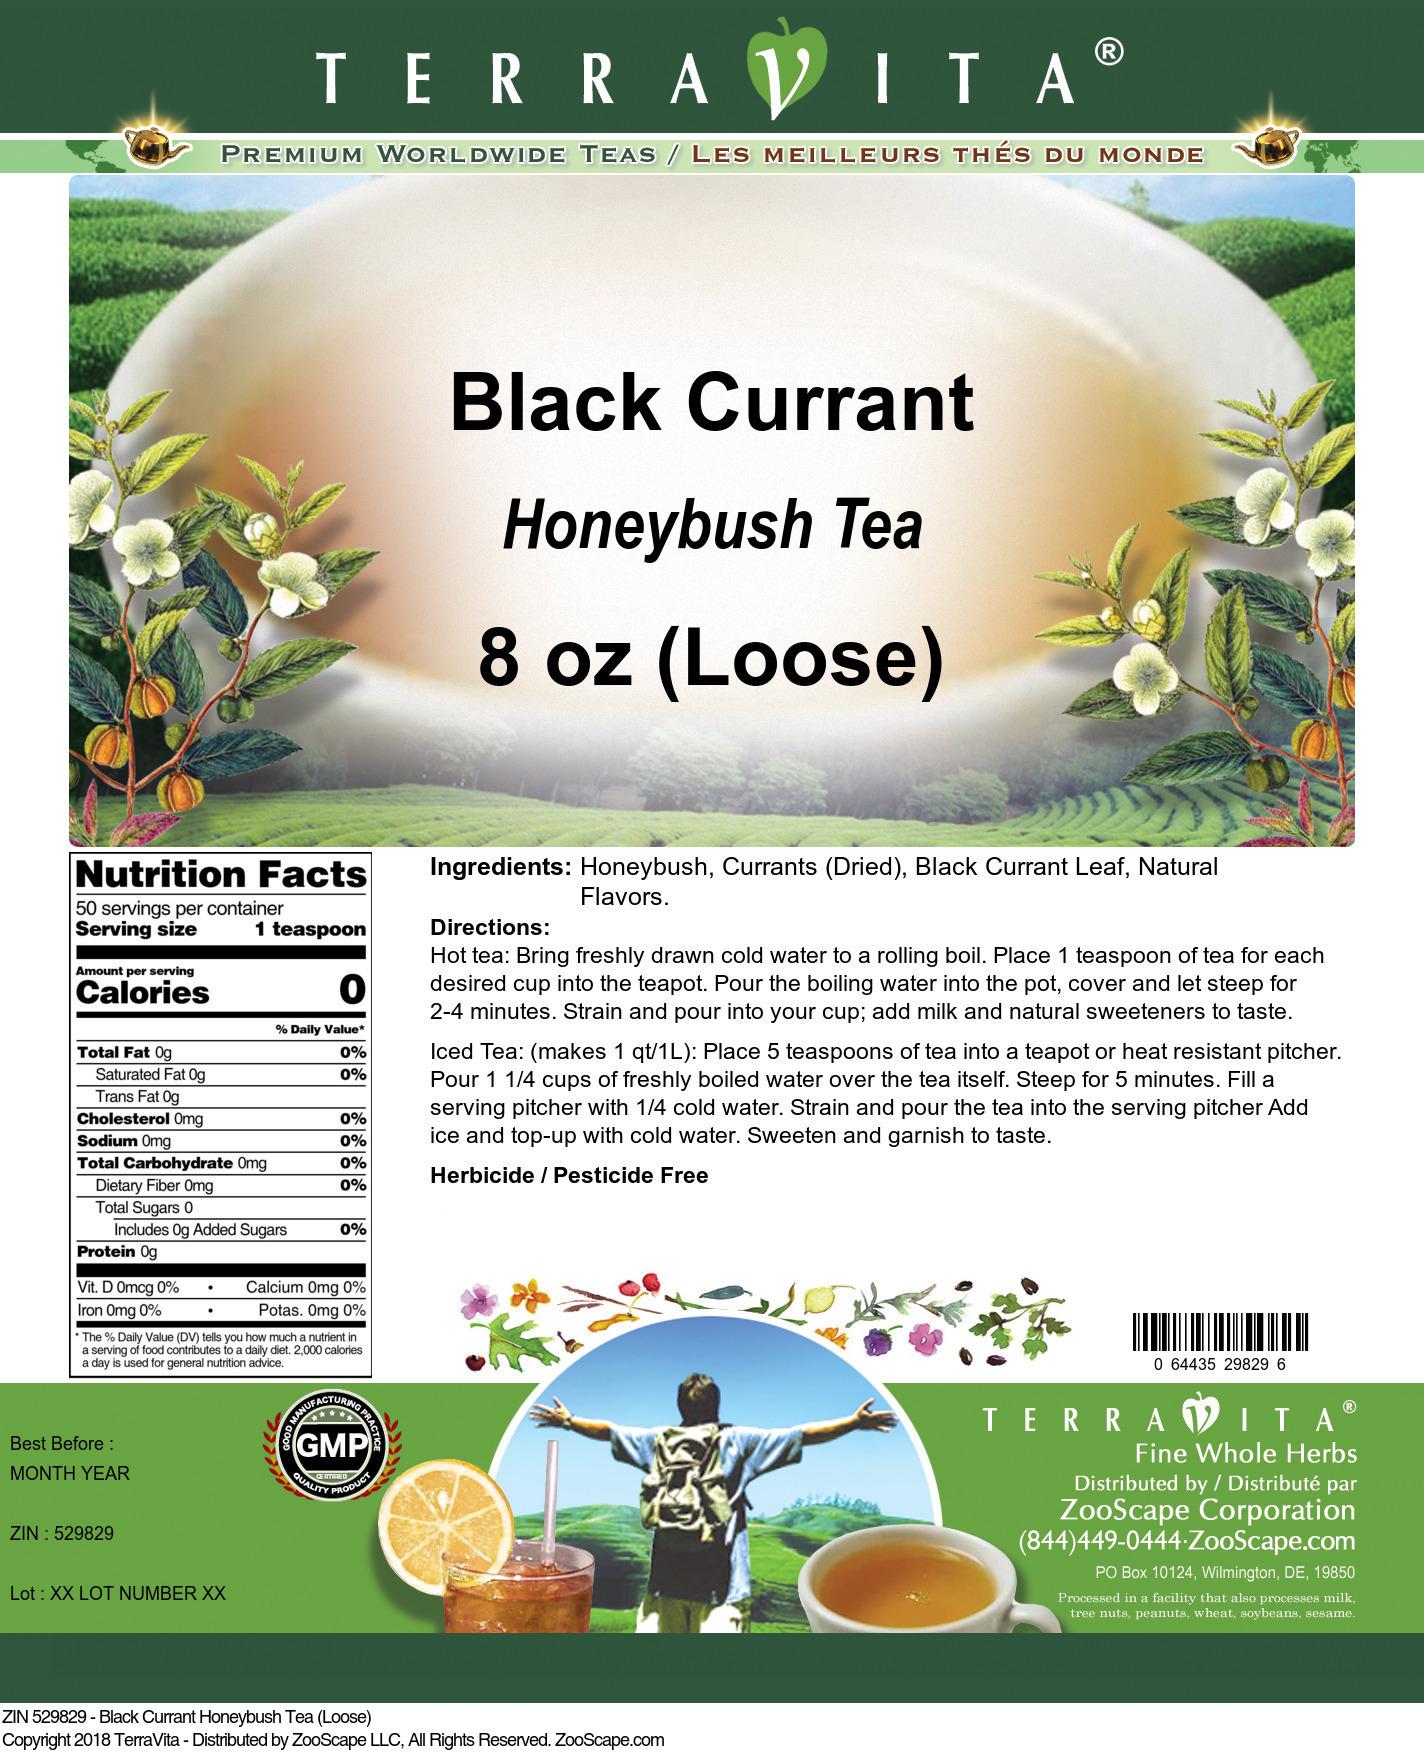 Black Currant Honeybush Tea (Loose)